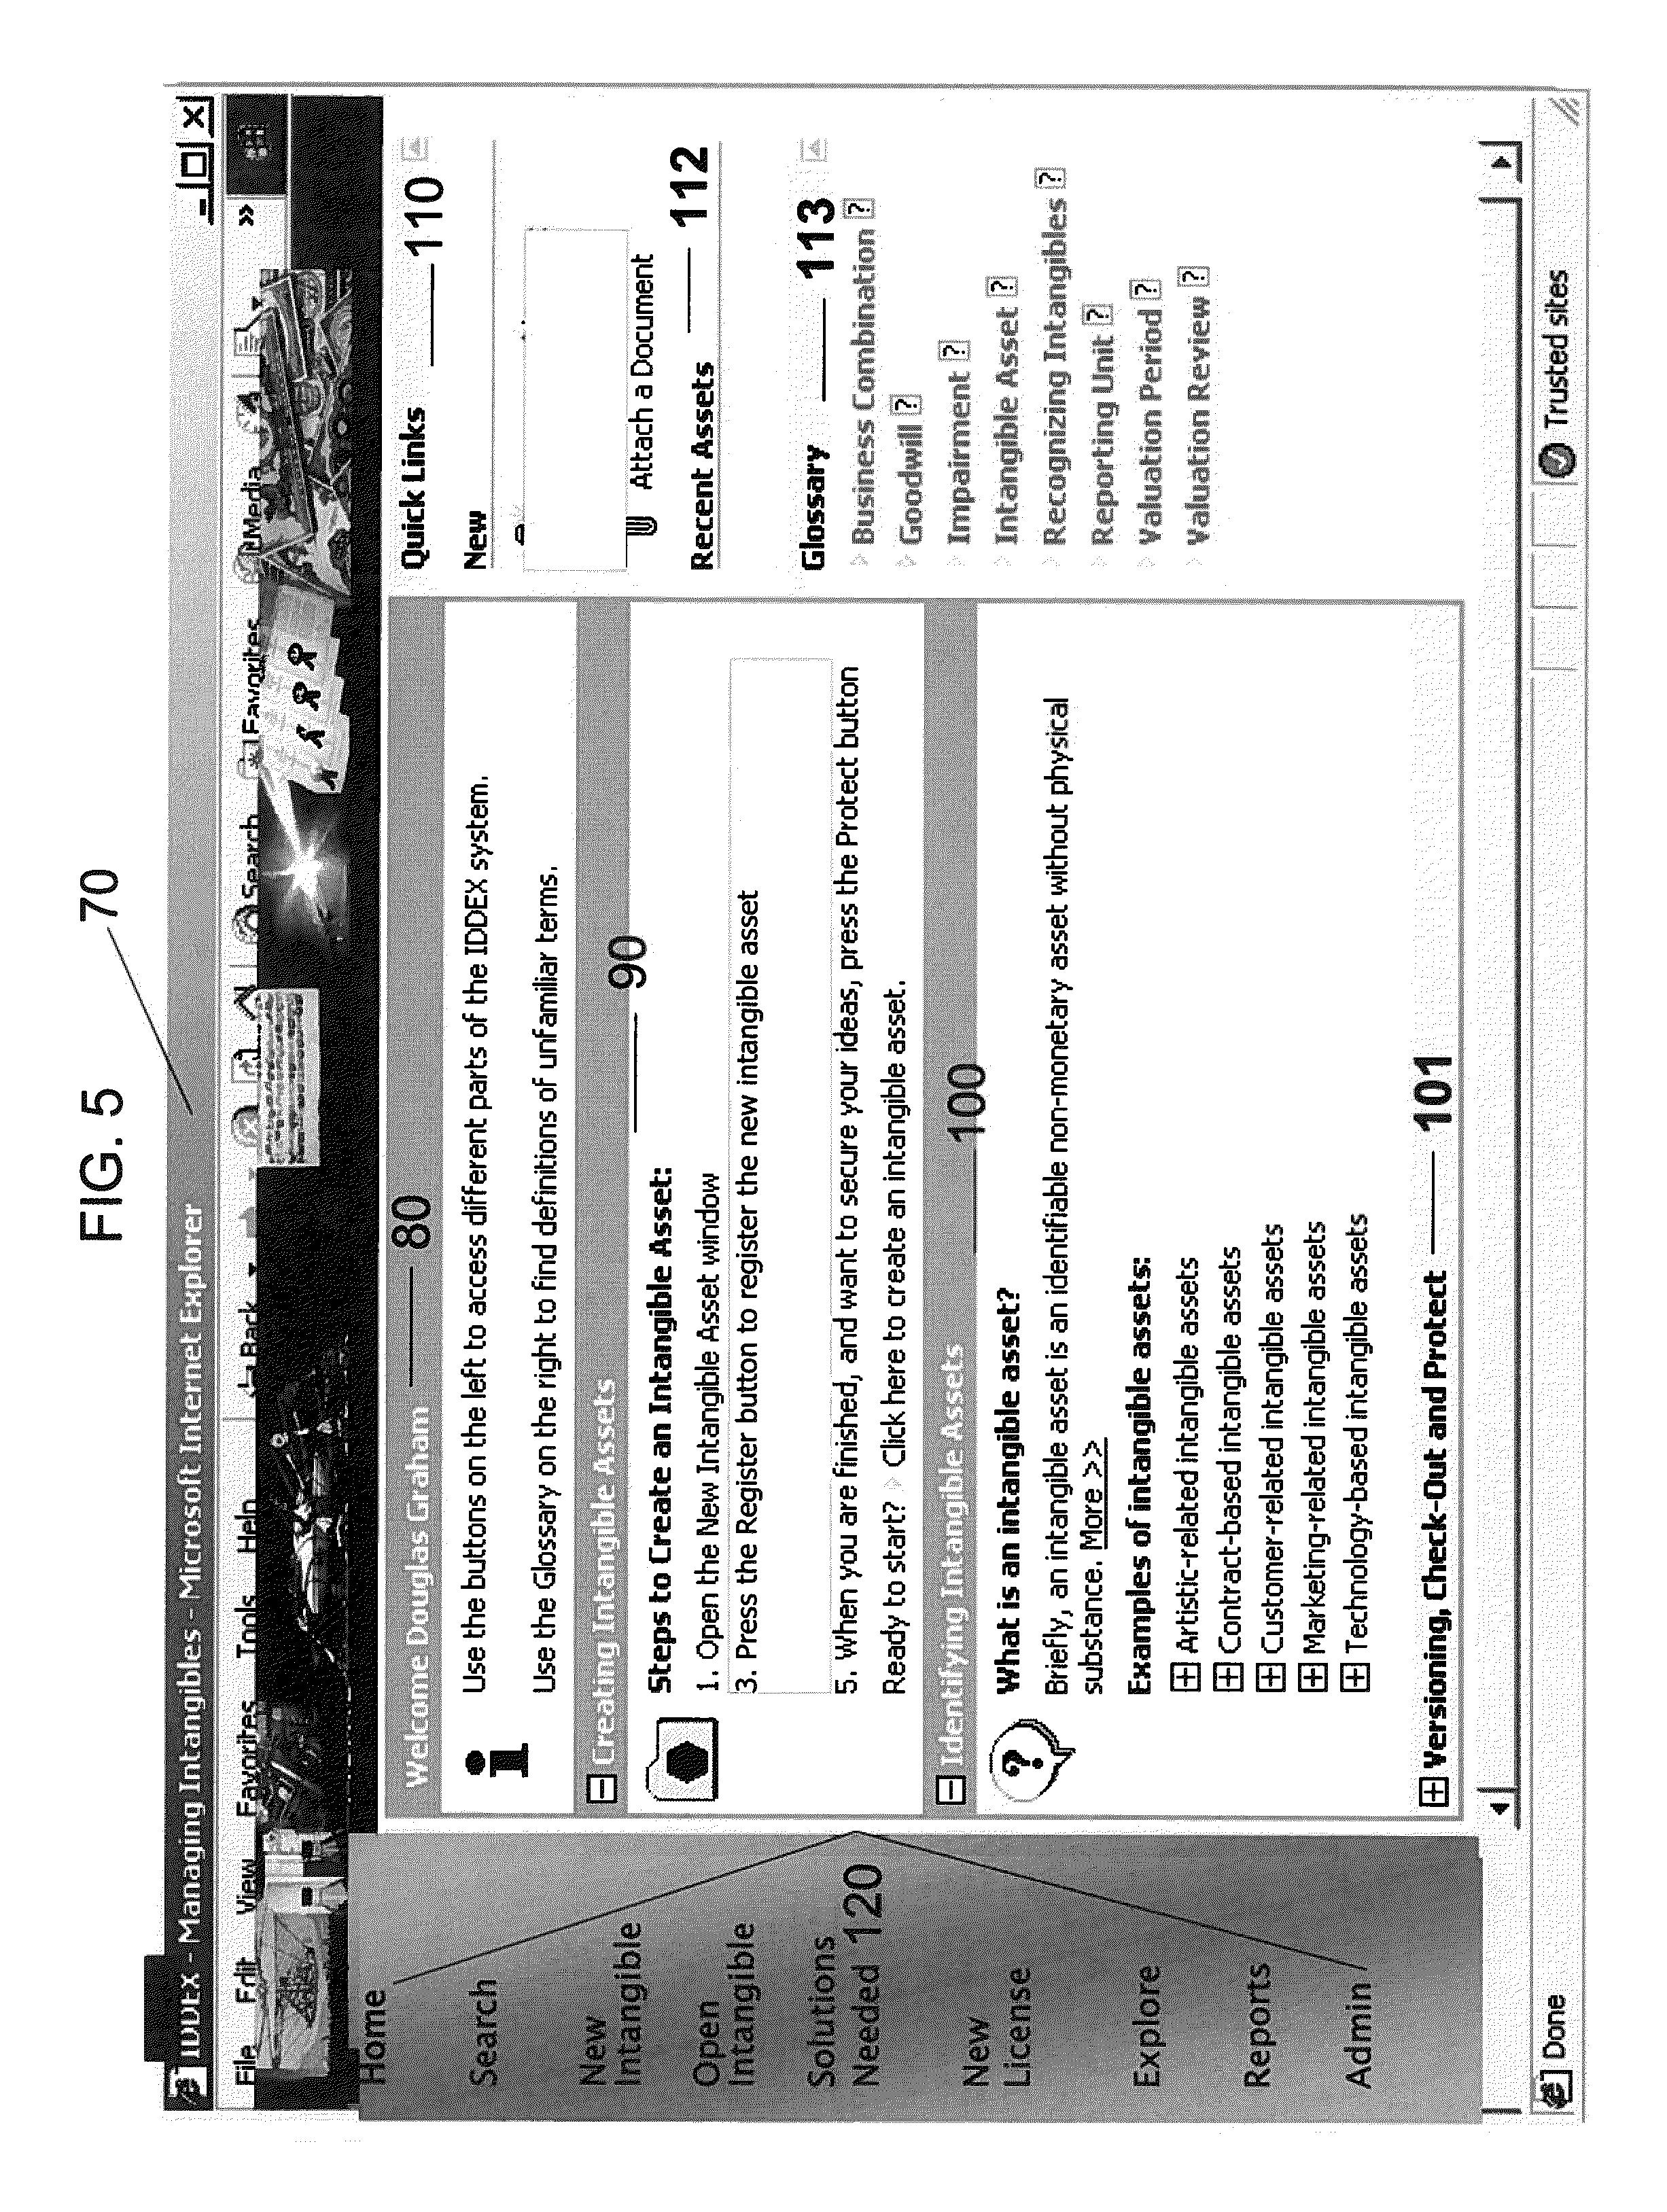 Patent US 8,332,740 B2